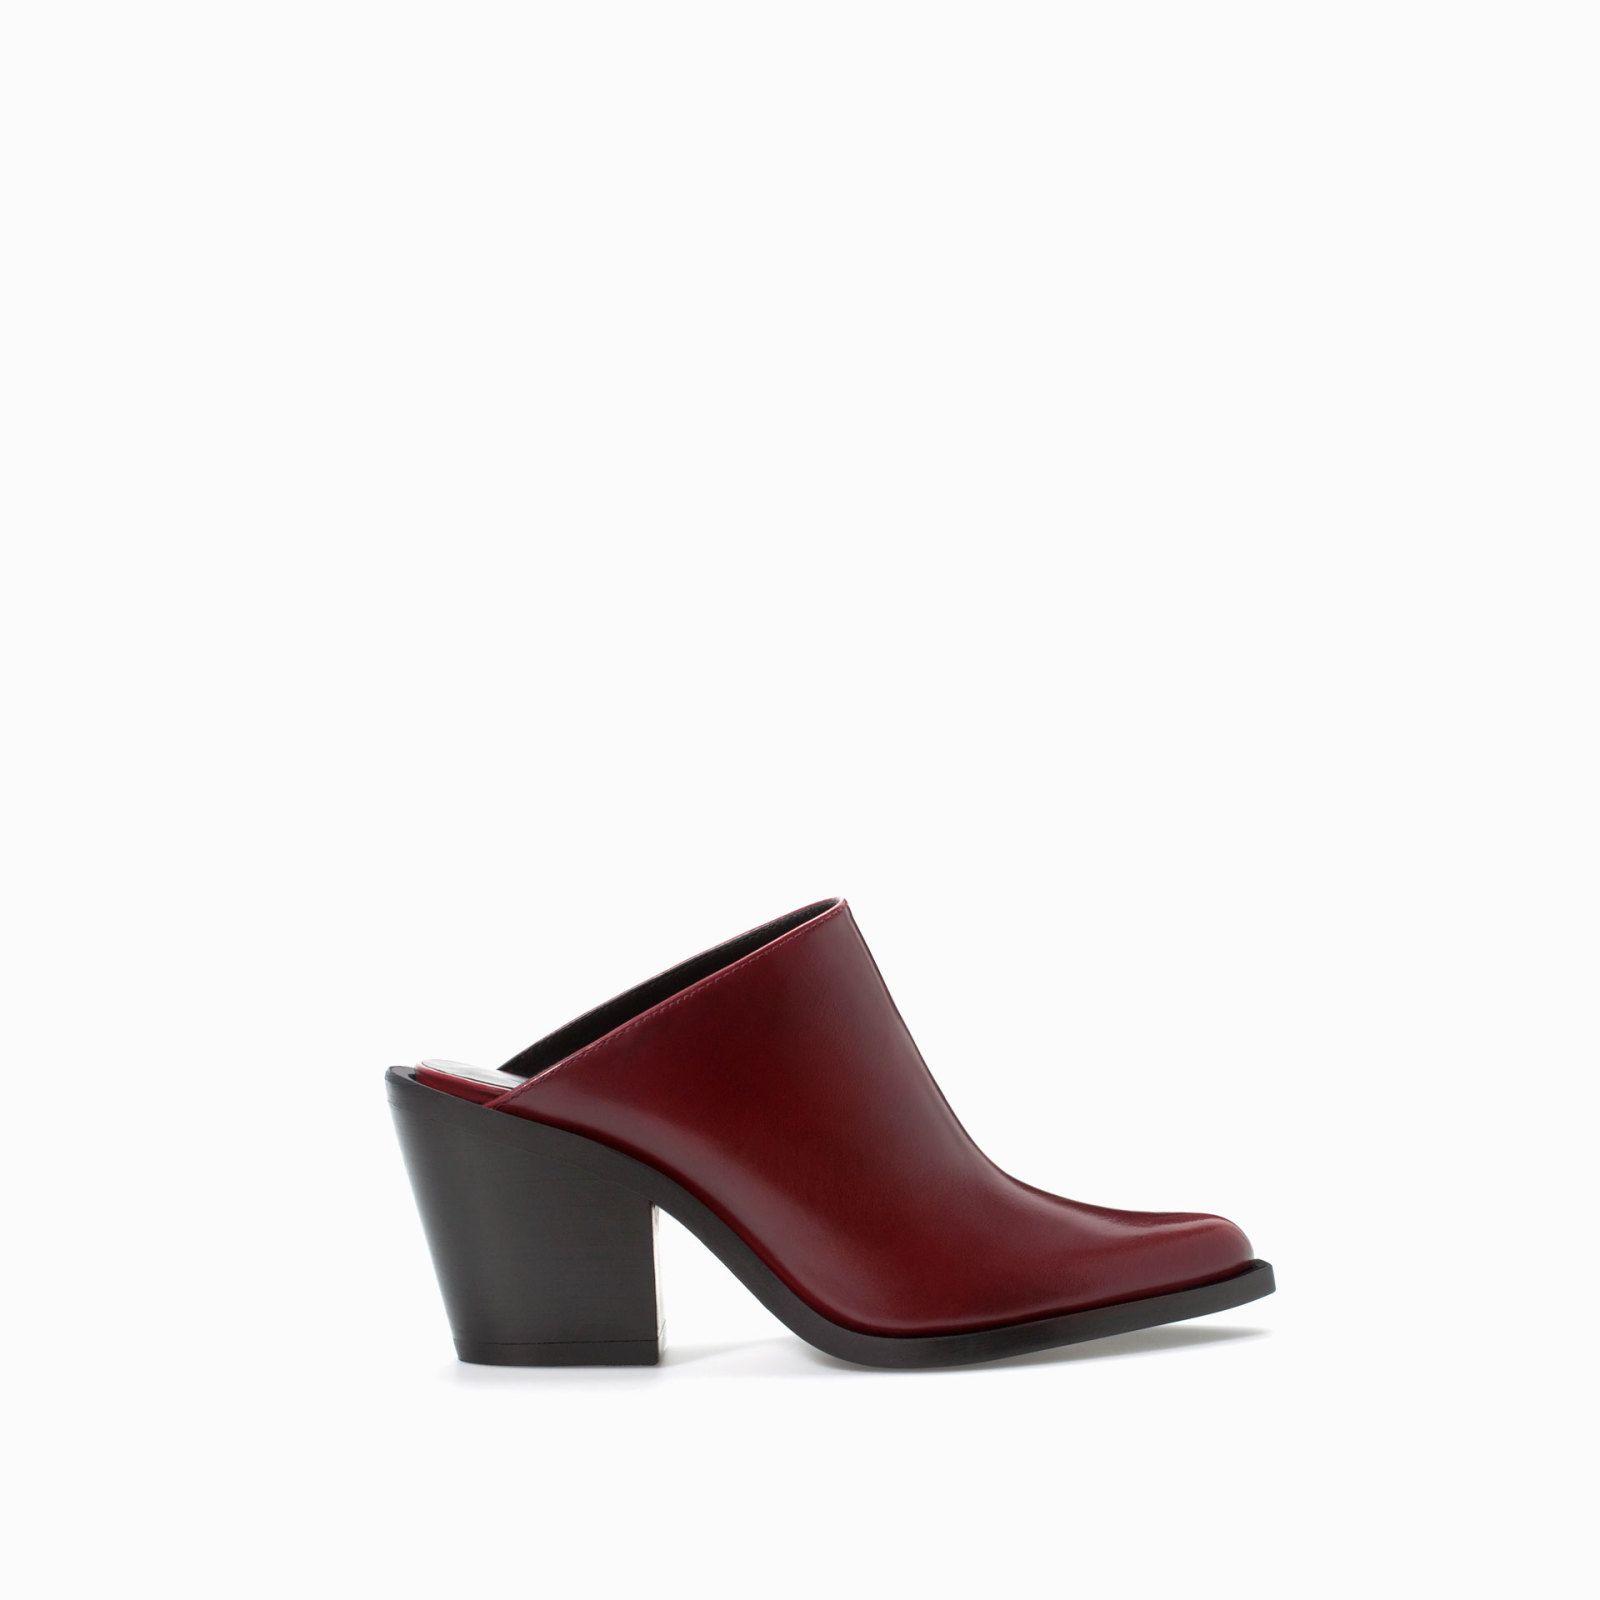 Leather high-heeled bootie, £69.99, Zara